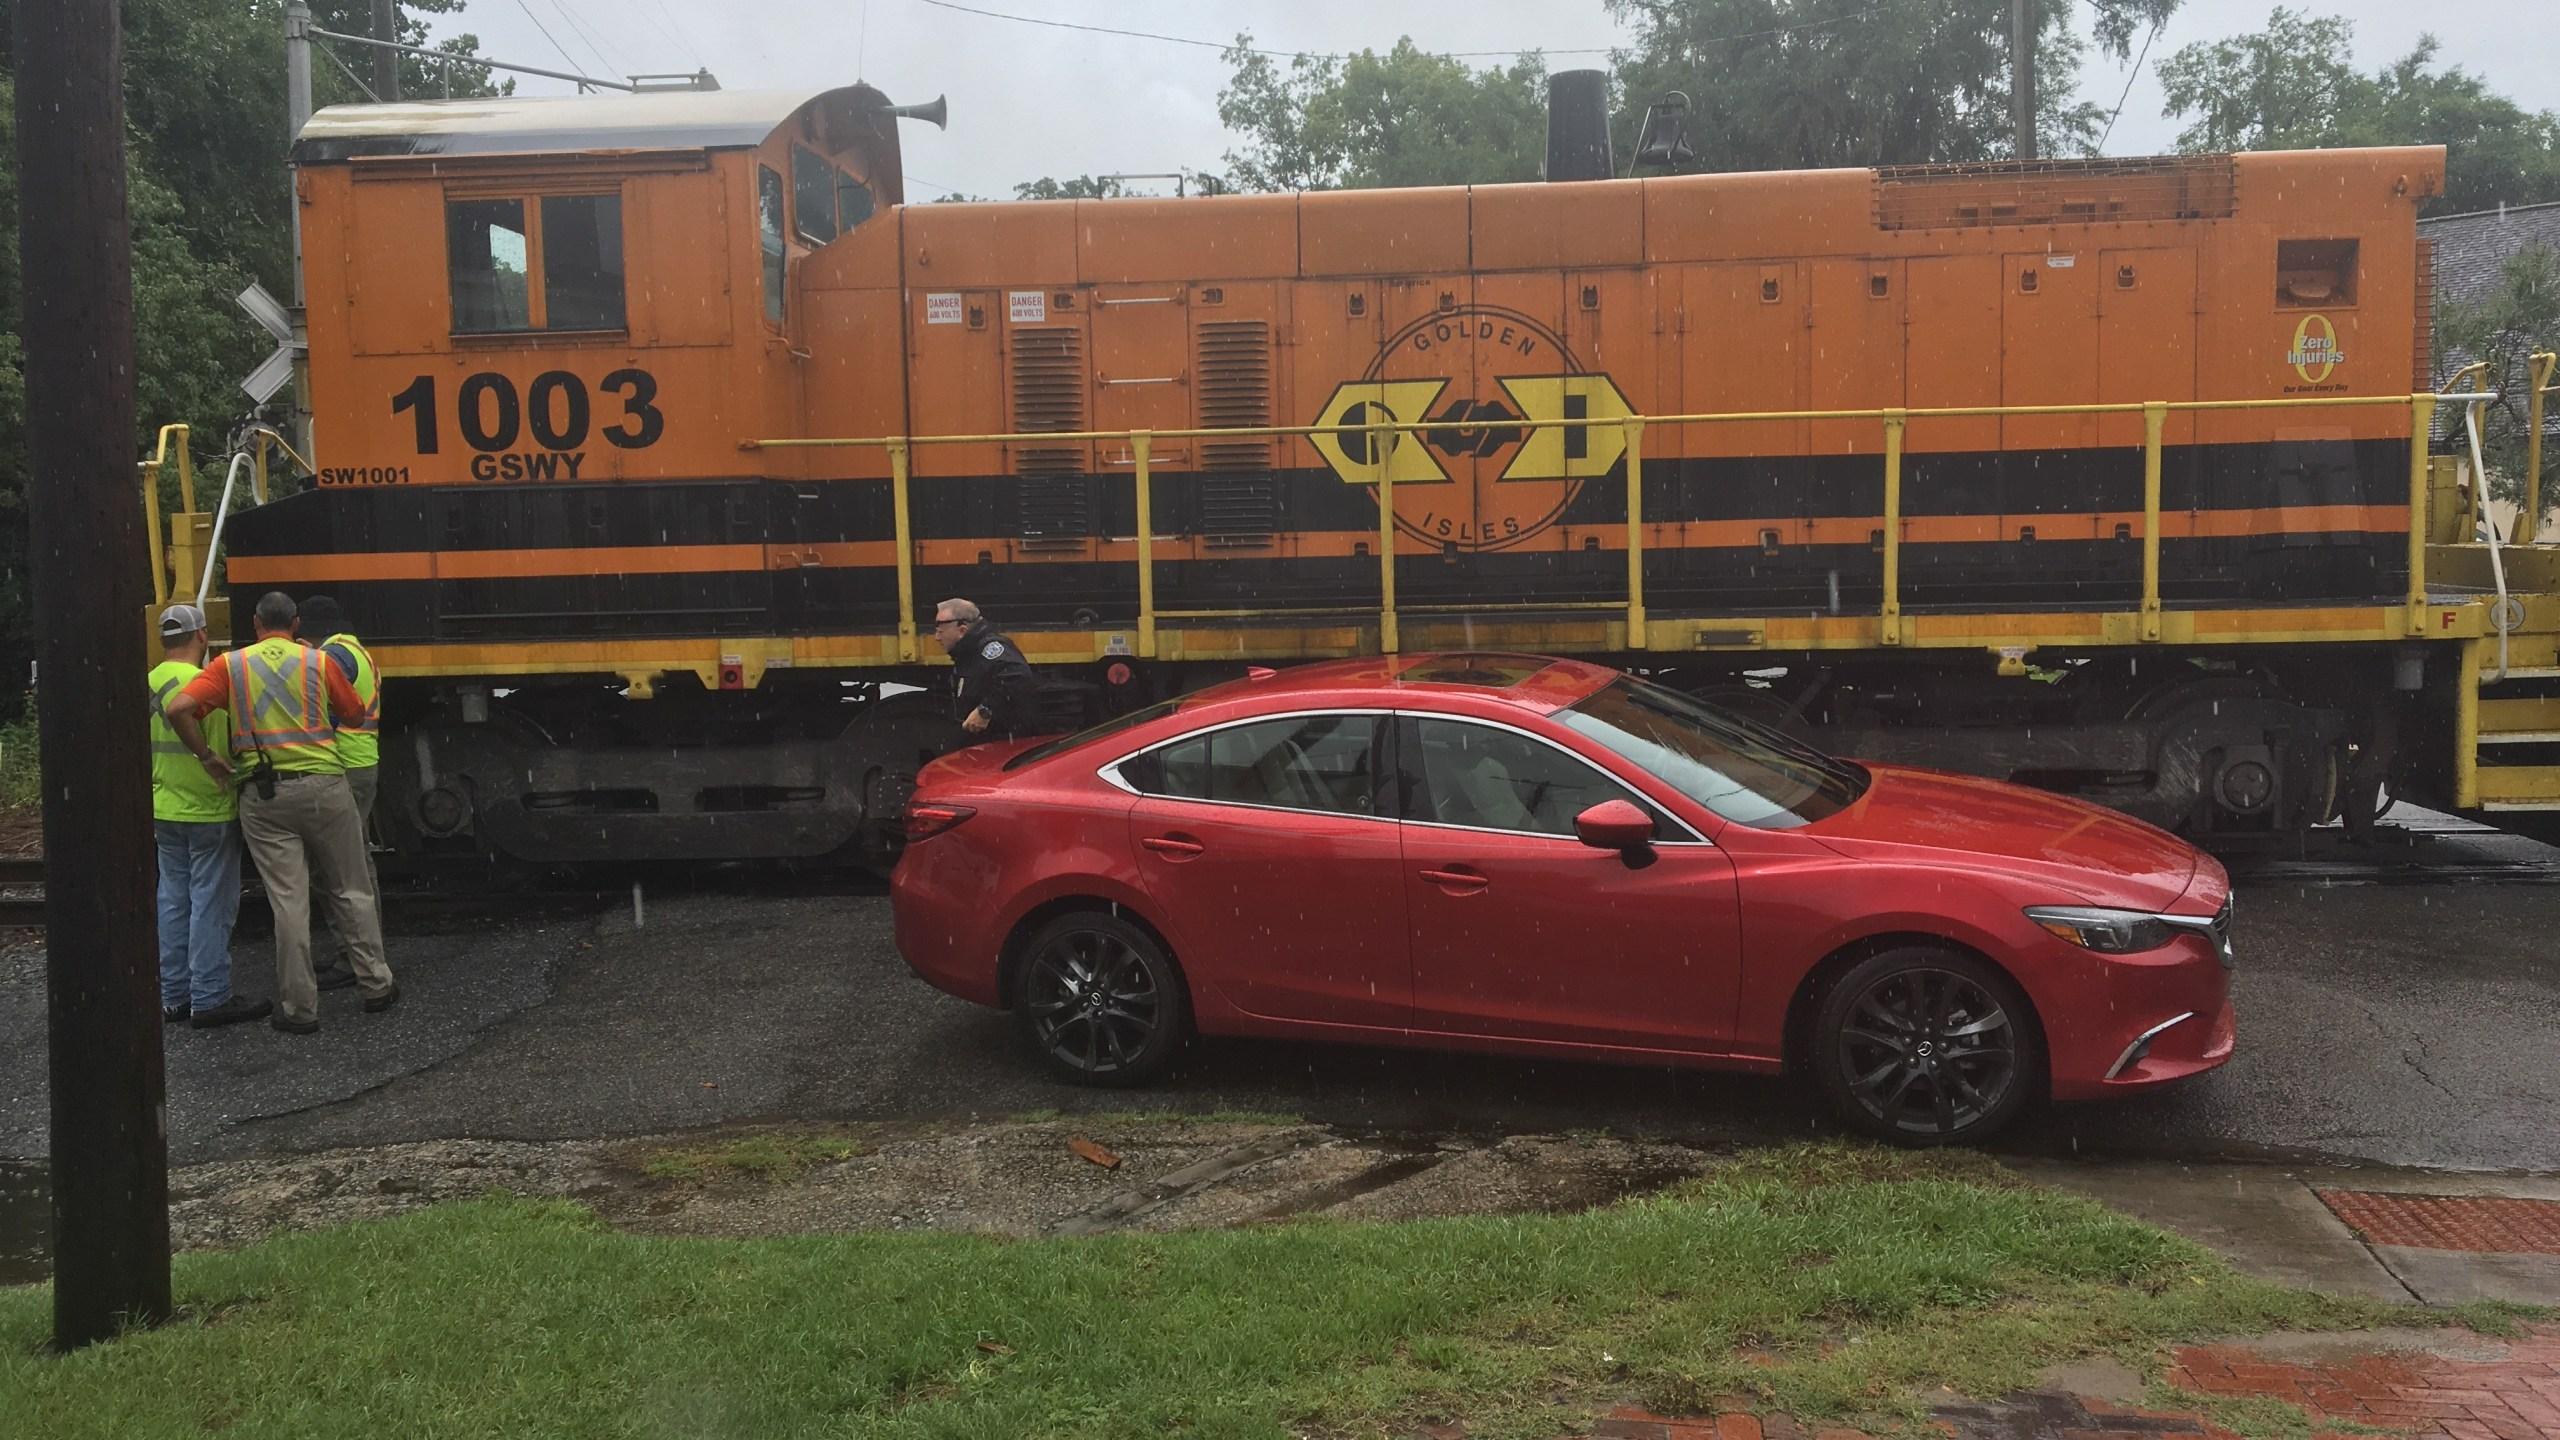 Car vs train, photo 2